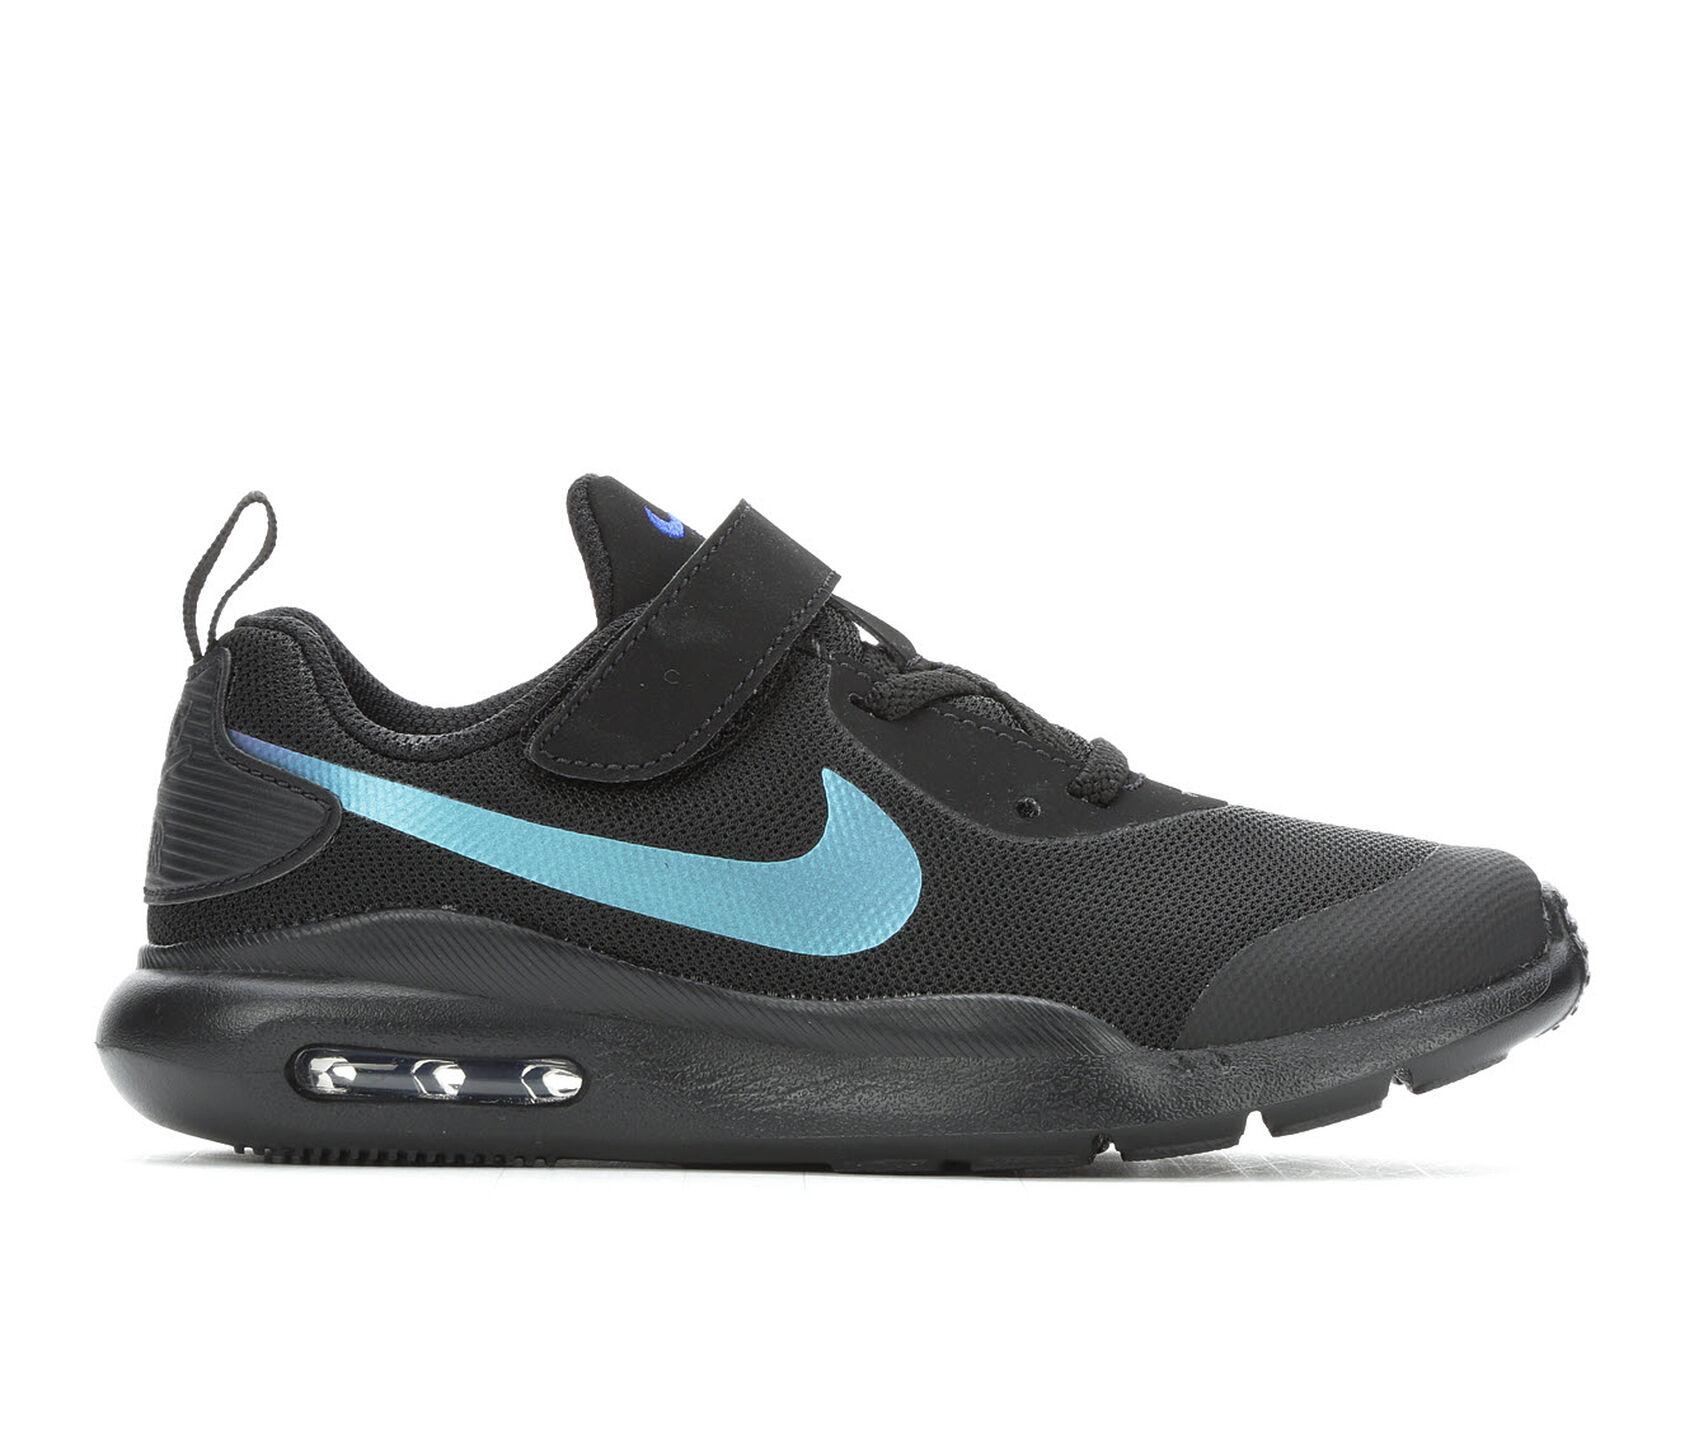 3c853afdaa3b6 Boys' Nike Little Kid Air Max Oketo Running Shoes | Shoe Carnival